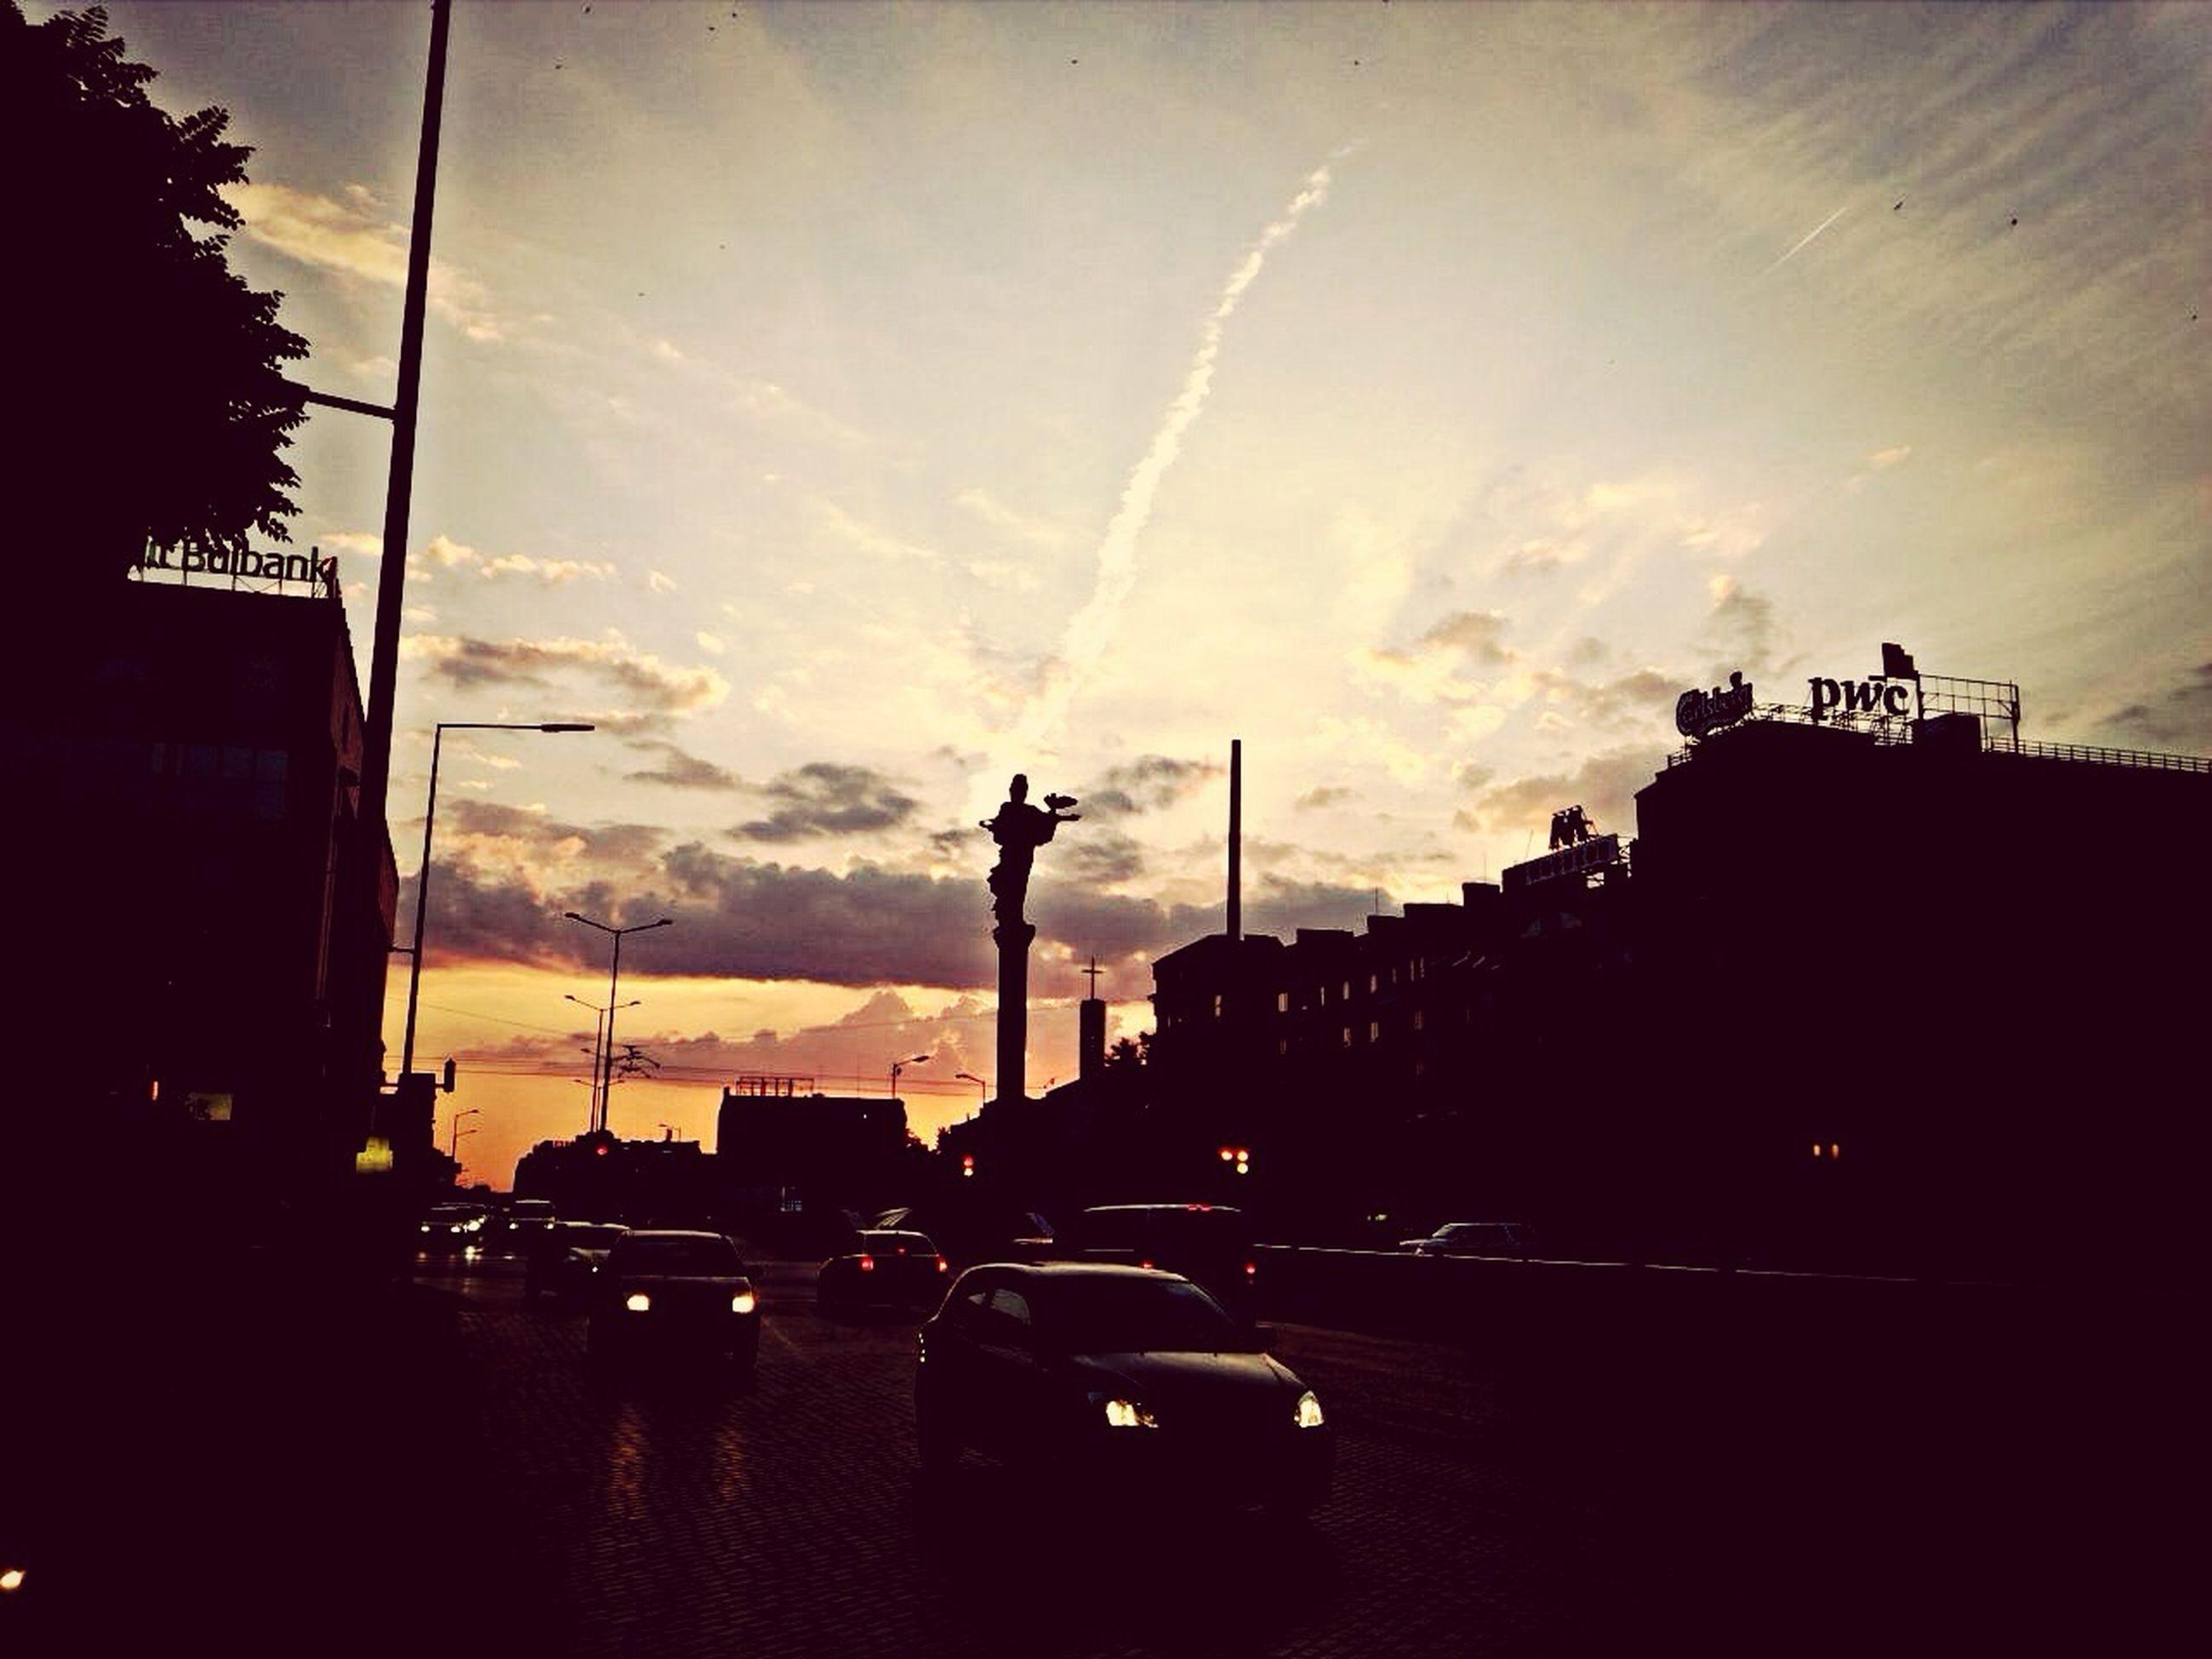 transportation, silhouette, sunset, building exterior, sky, mode of transport, built structure, architecture, land vehicle, car, street, cloud - sky, city, street light, dusk, road, illuminated, outdoors, cloud, building